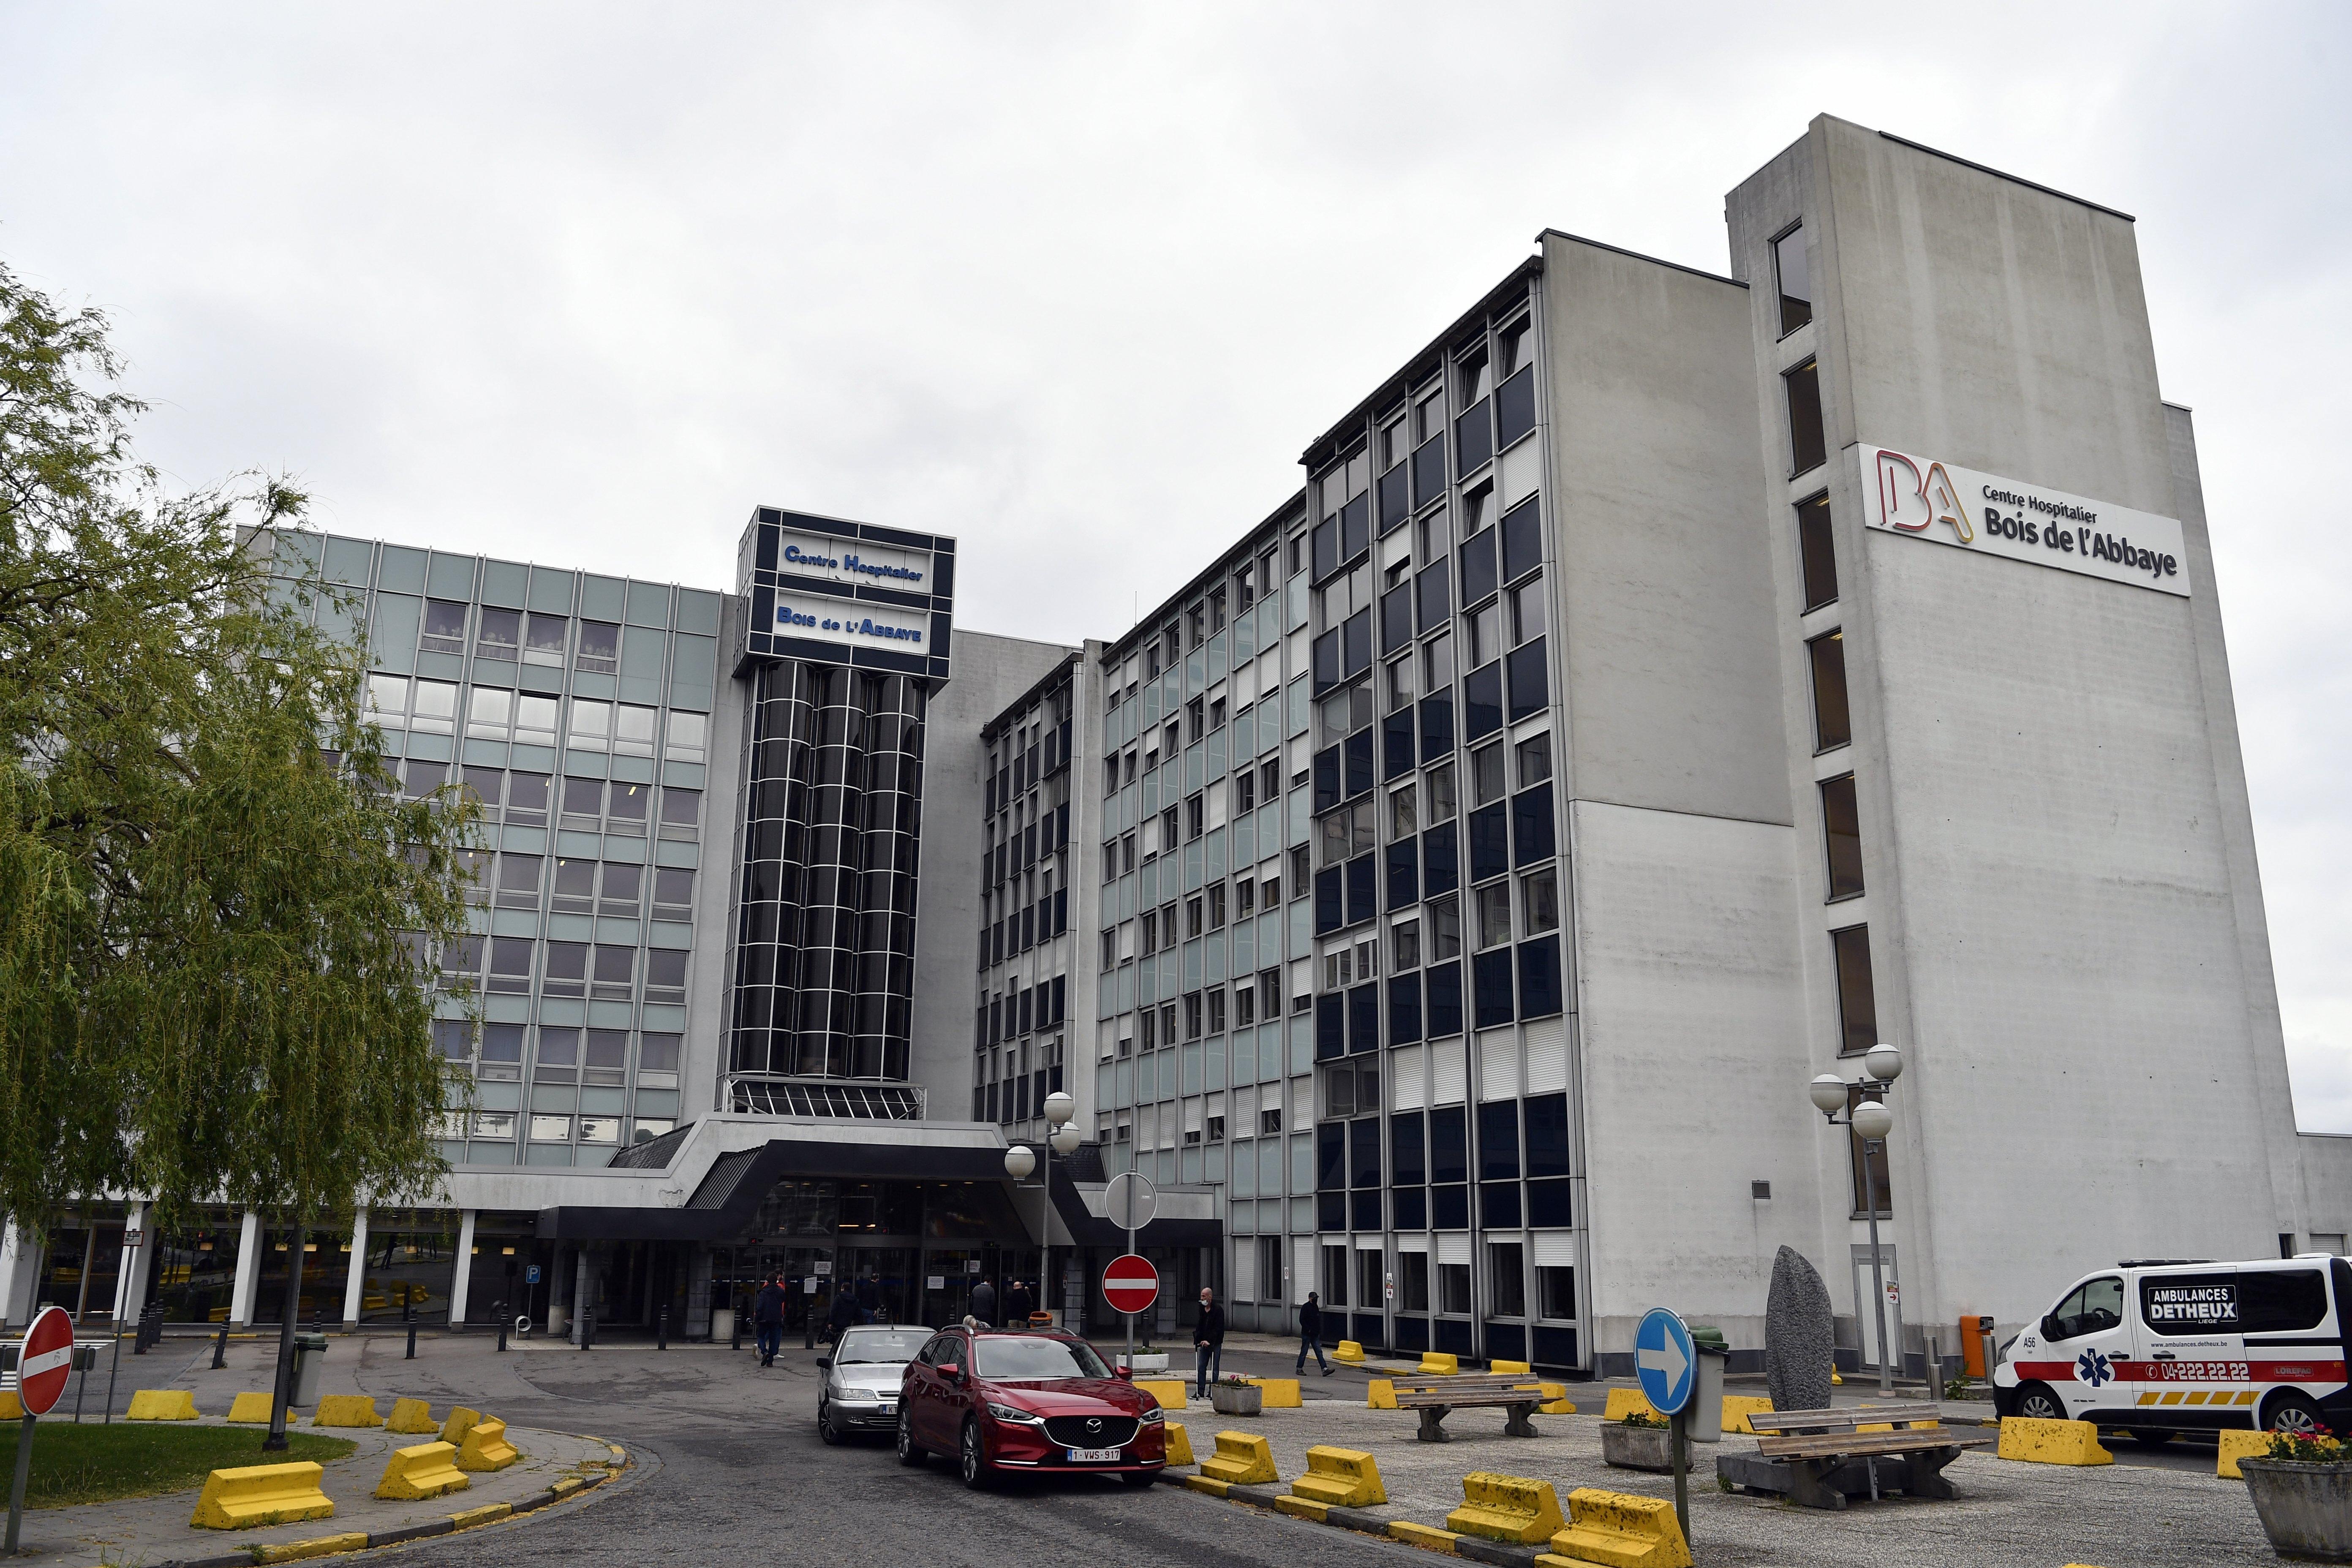 The Centre Hospitalier du Bois de l'Abbaye, in Seraing, Belgium, pictured in April 2020.